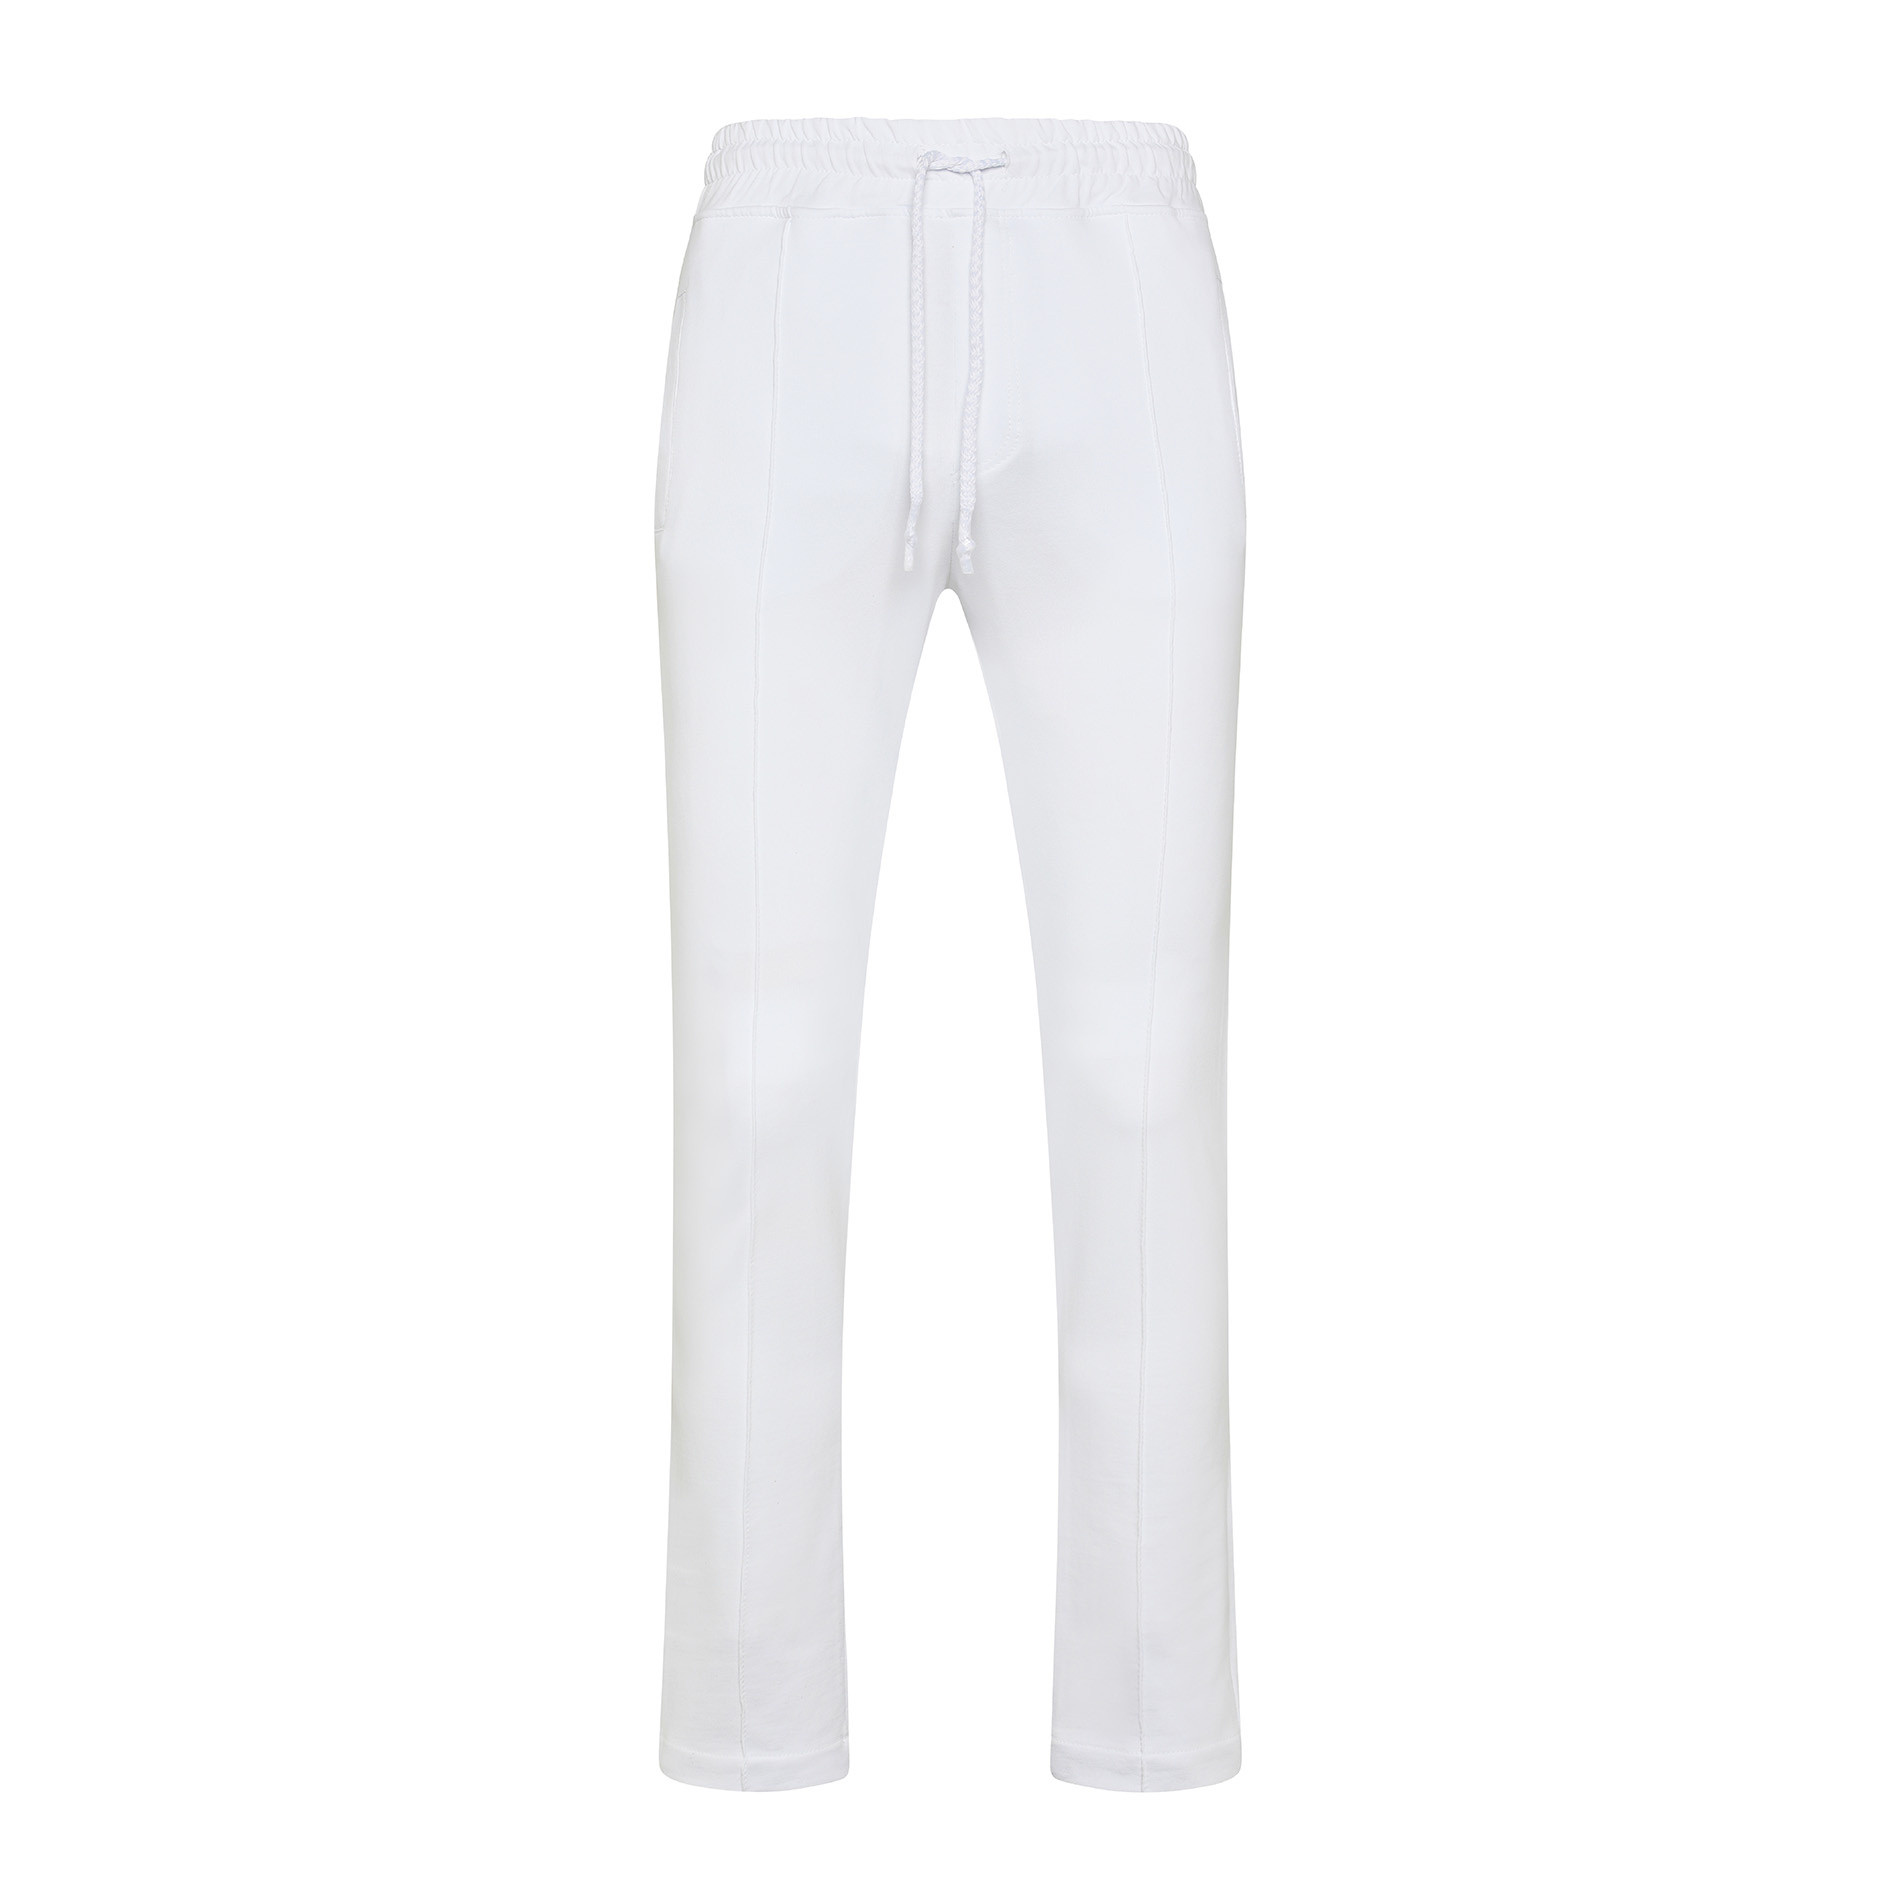 Pantalone felpa di cotone JCT, Bianco, large image number 0